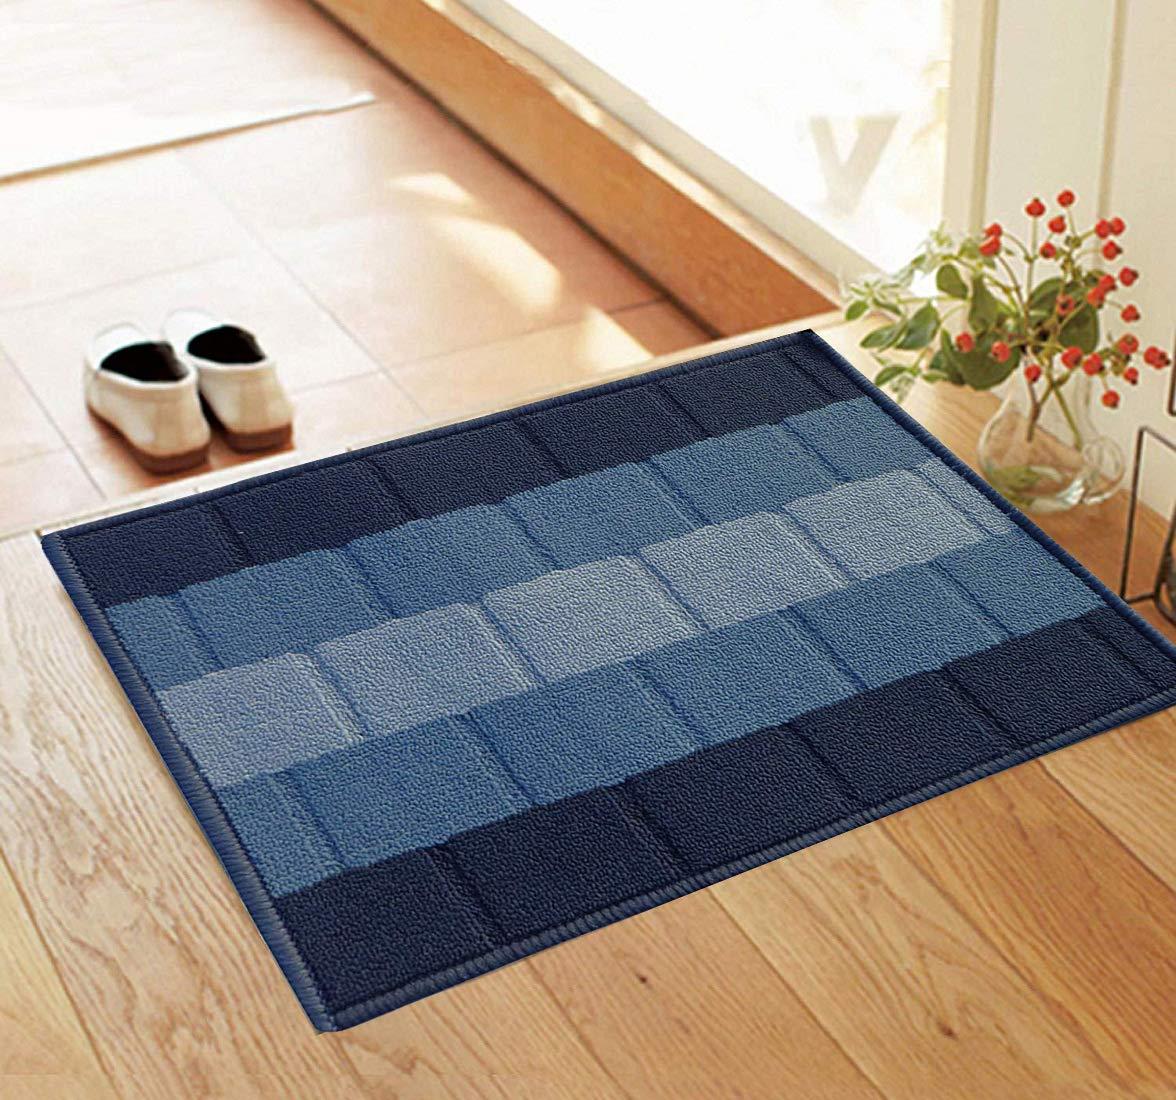 Status Polypropylene Anti Slip Floor Door Mat in Home Kitchen Office Entrance Mats ( 38x58 cm) (Blue)